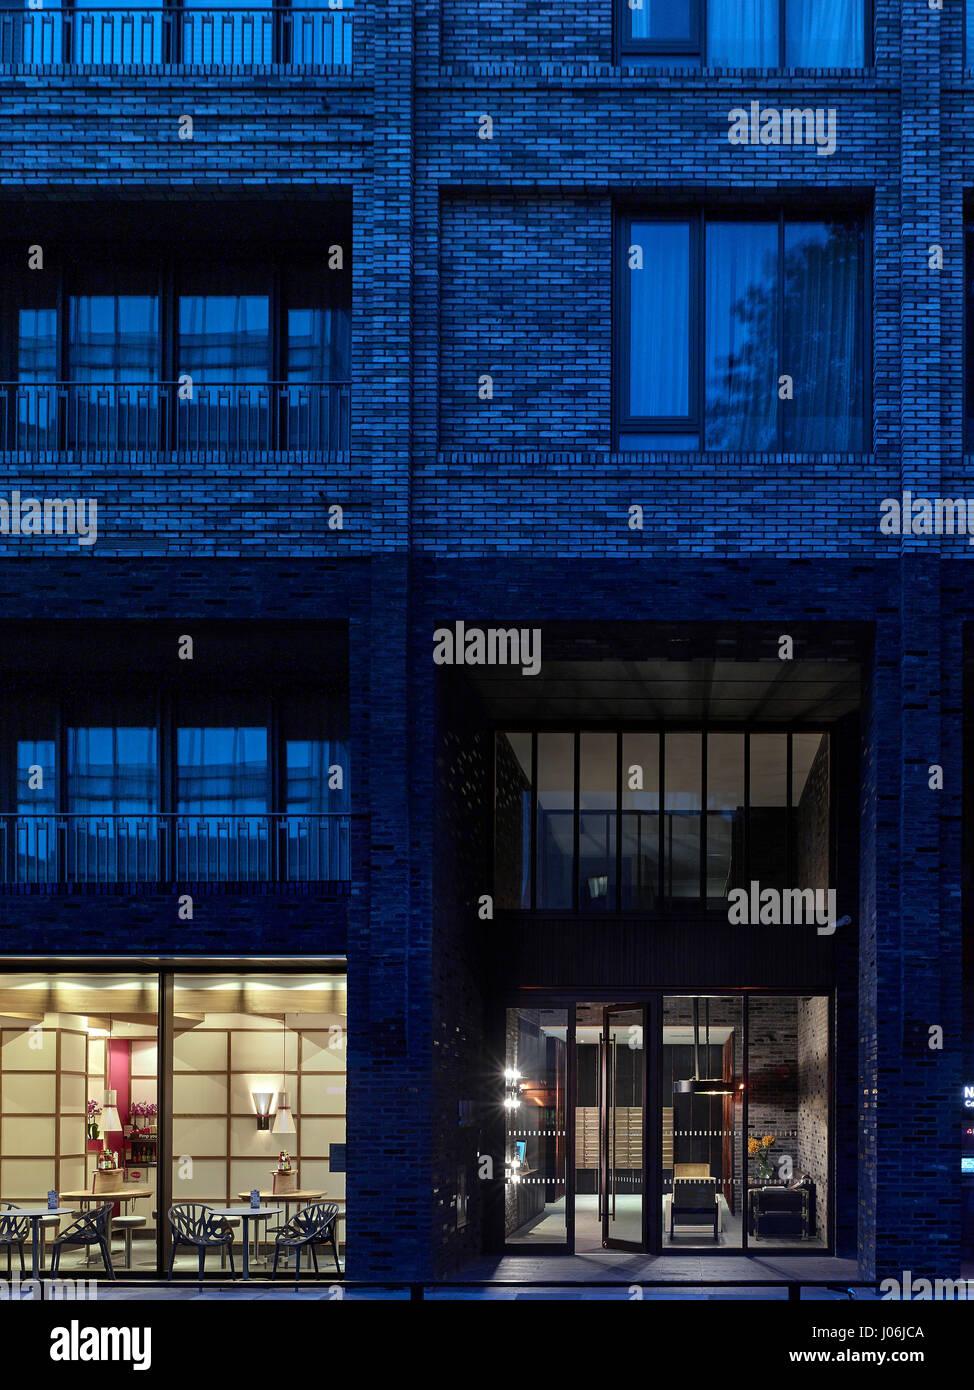 Entrance. 55 Victoria Street, London, United Kingdom. Architect: Stiff + Trevillion Architects, 2016. - Stock Image